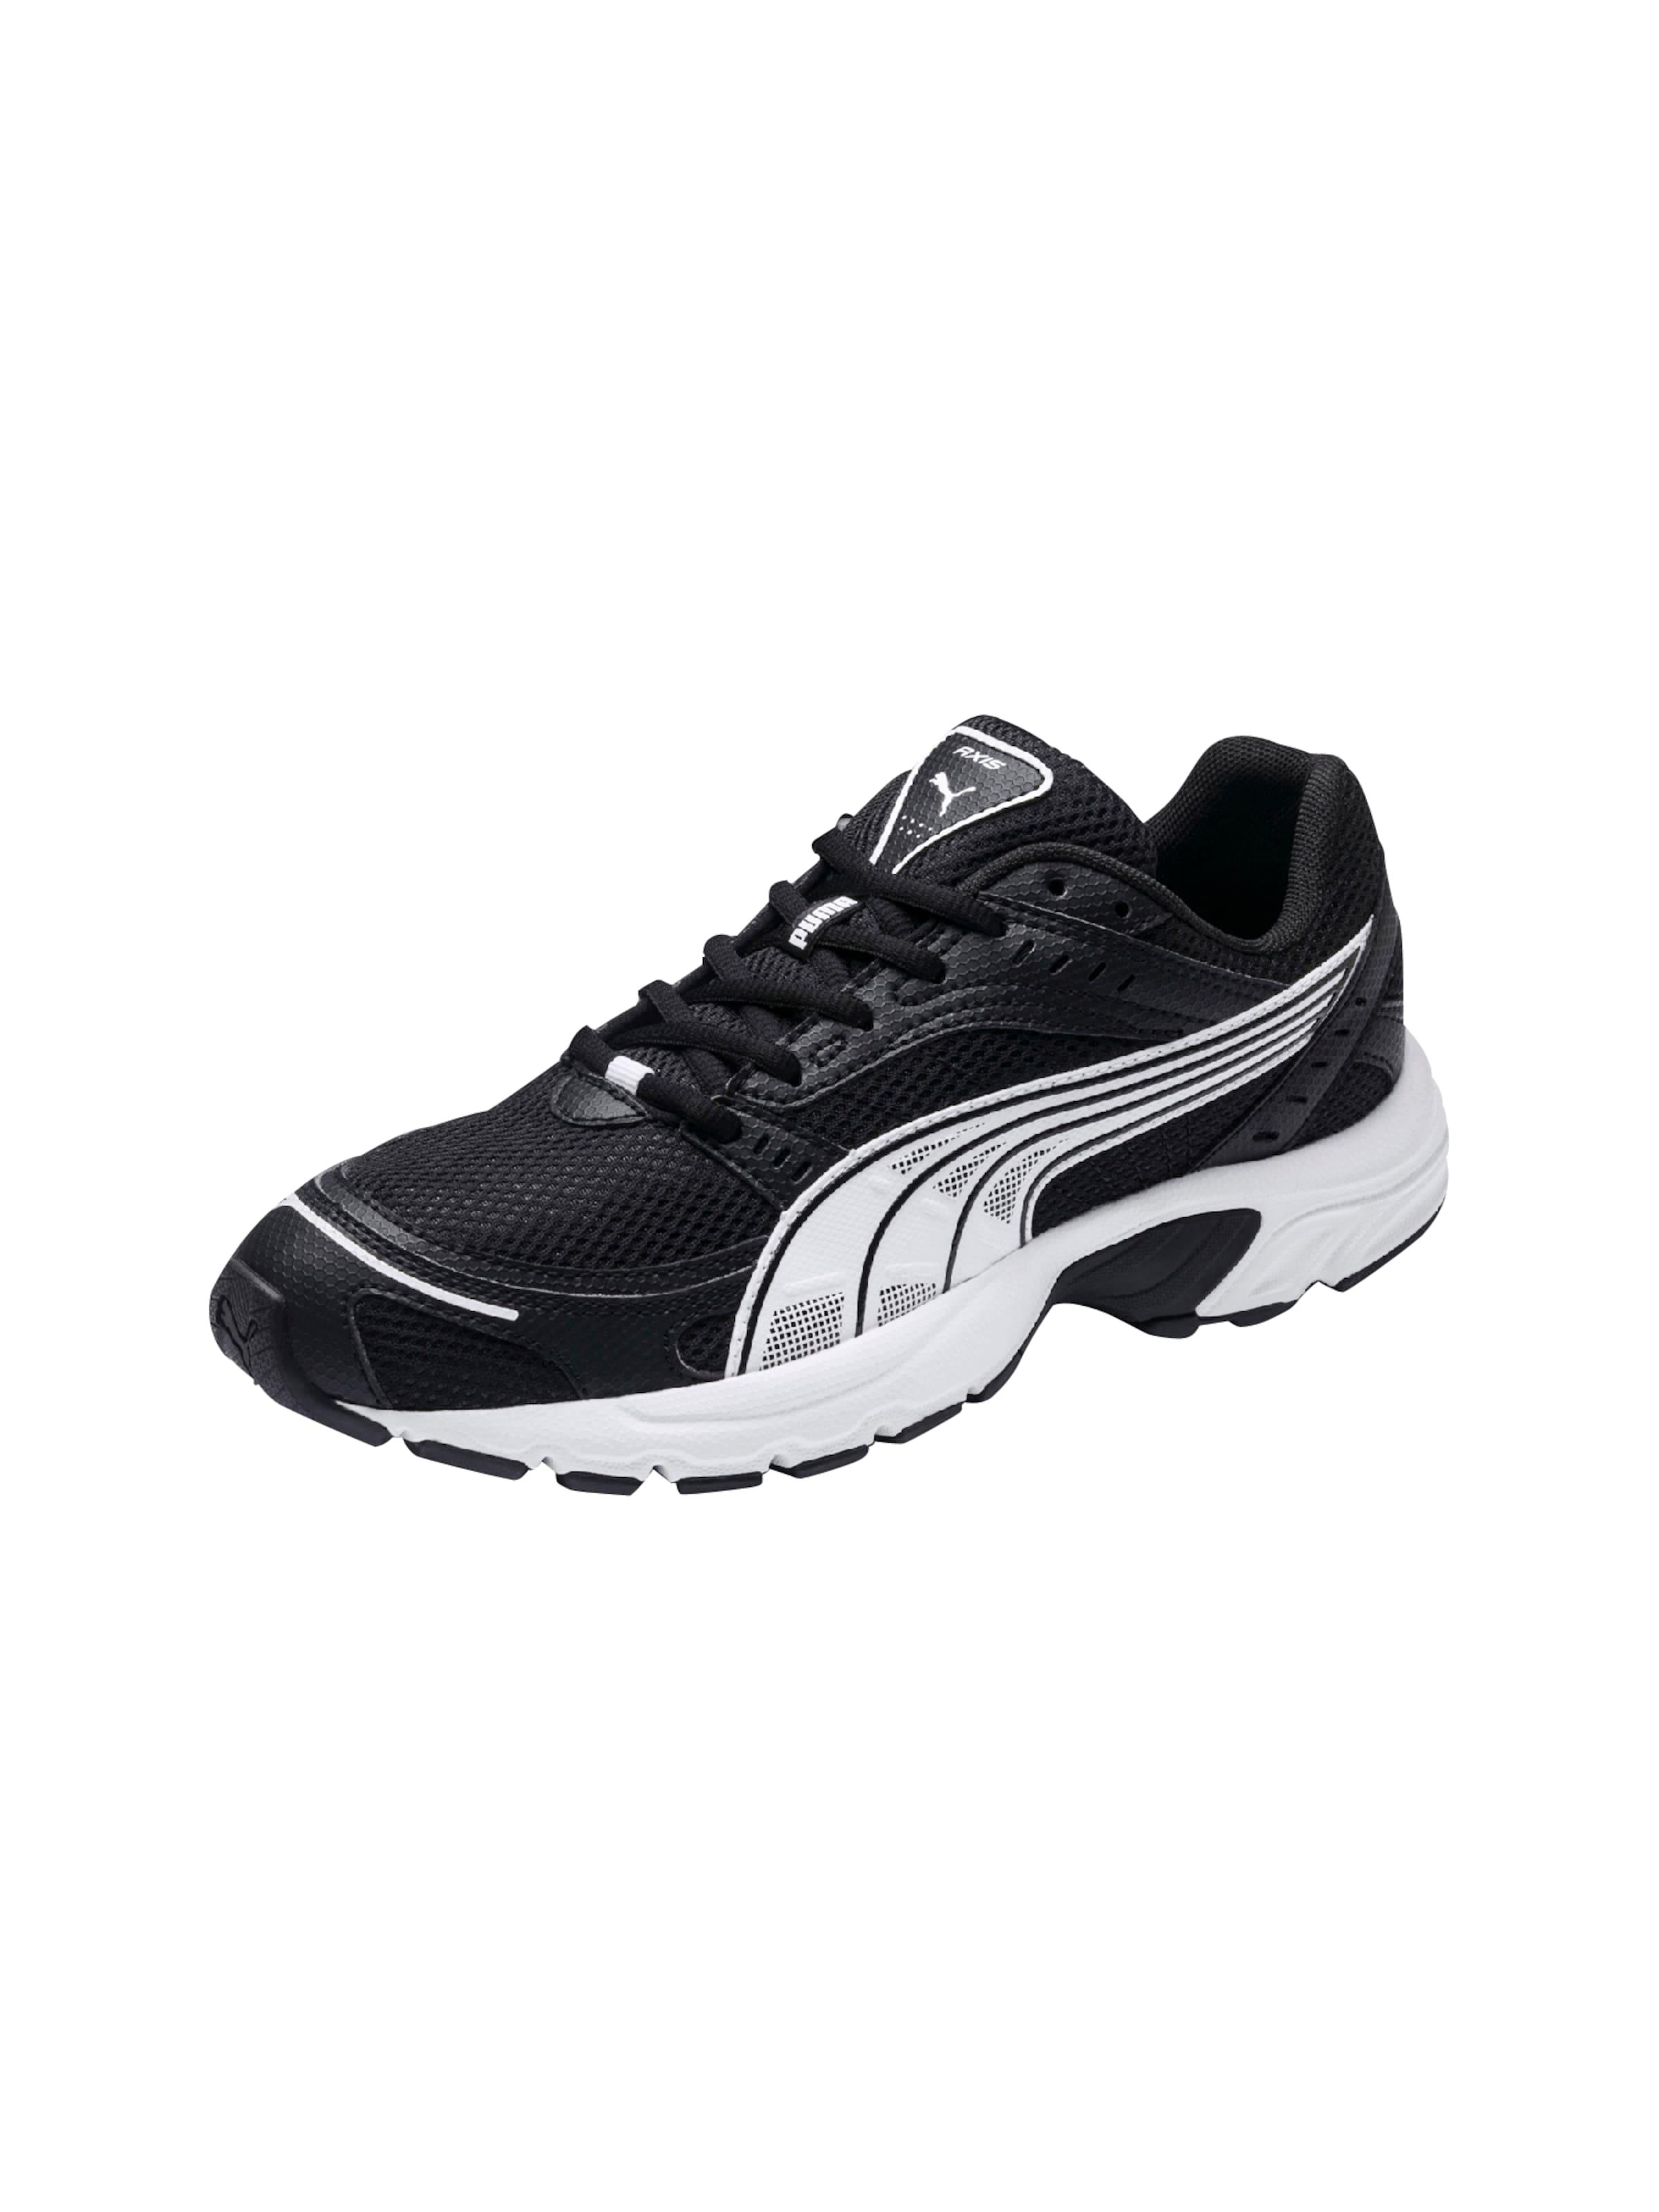 Puma Sneaker 'axis' In Puma 'axis' RosaWeiß Sneaker In PknO8w0